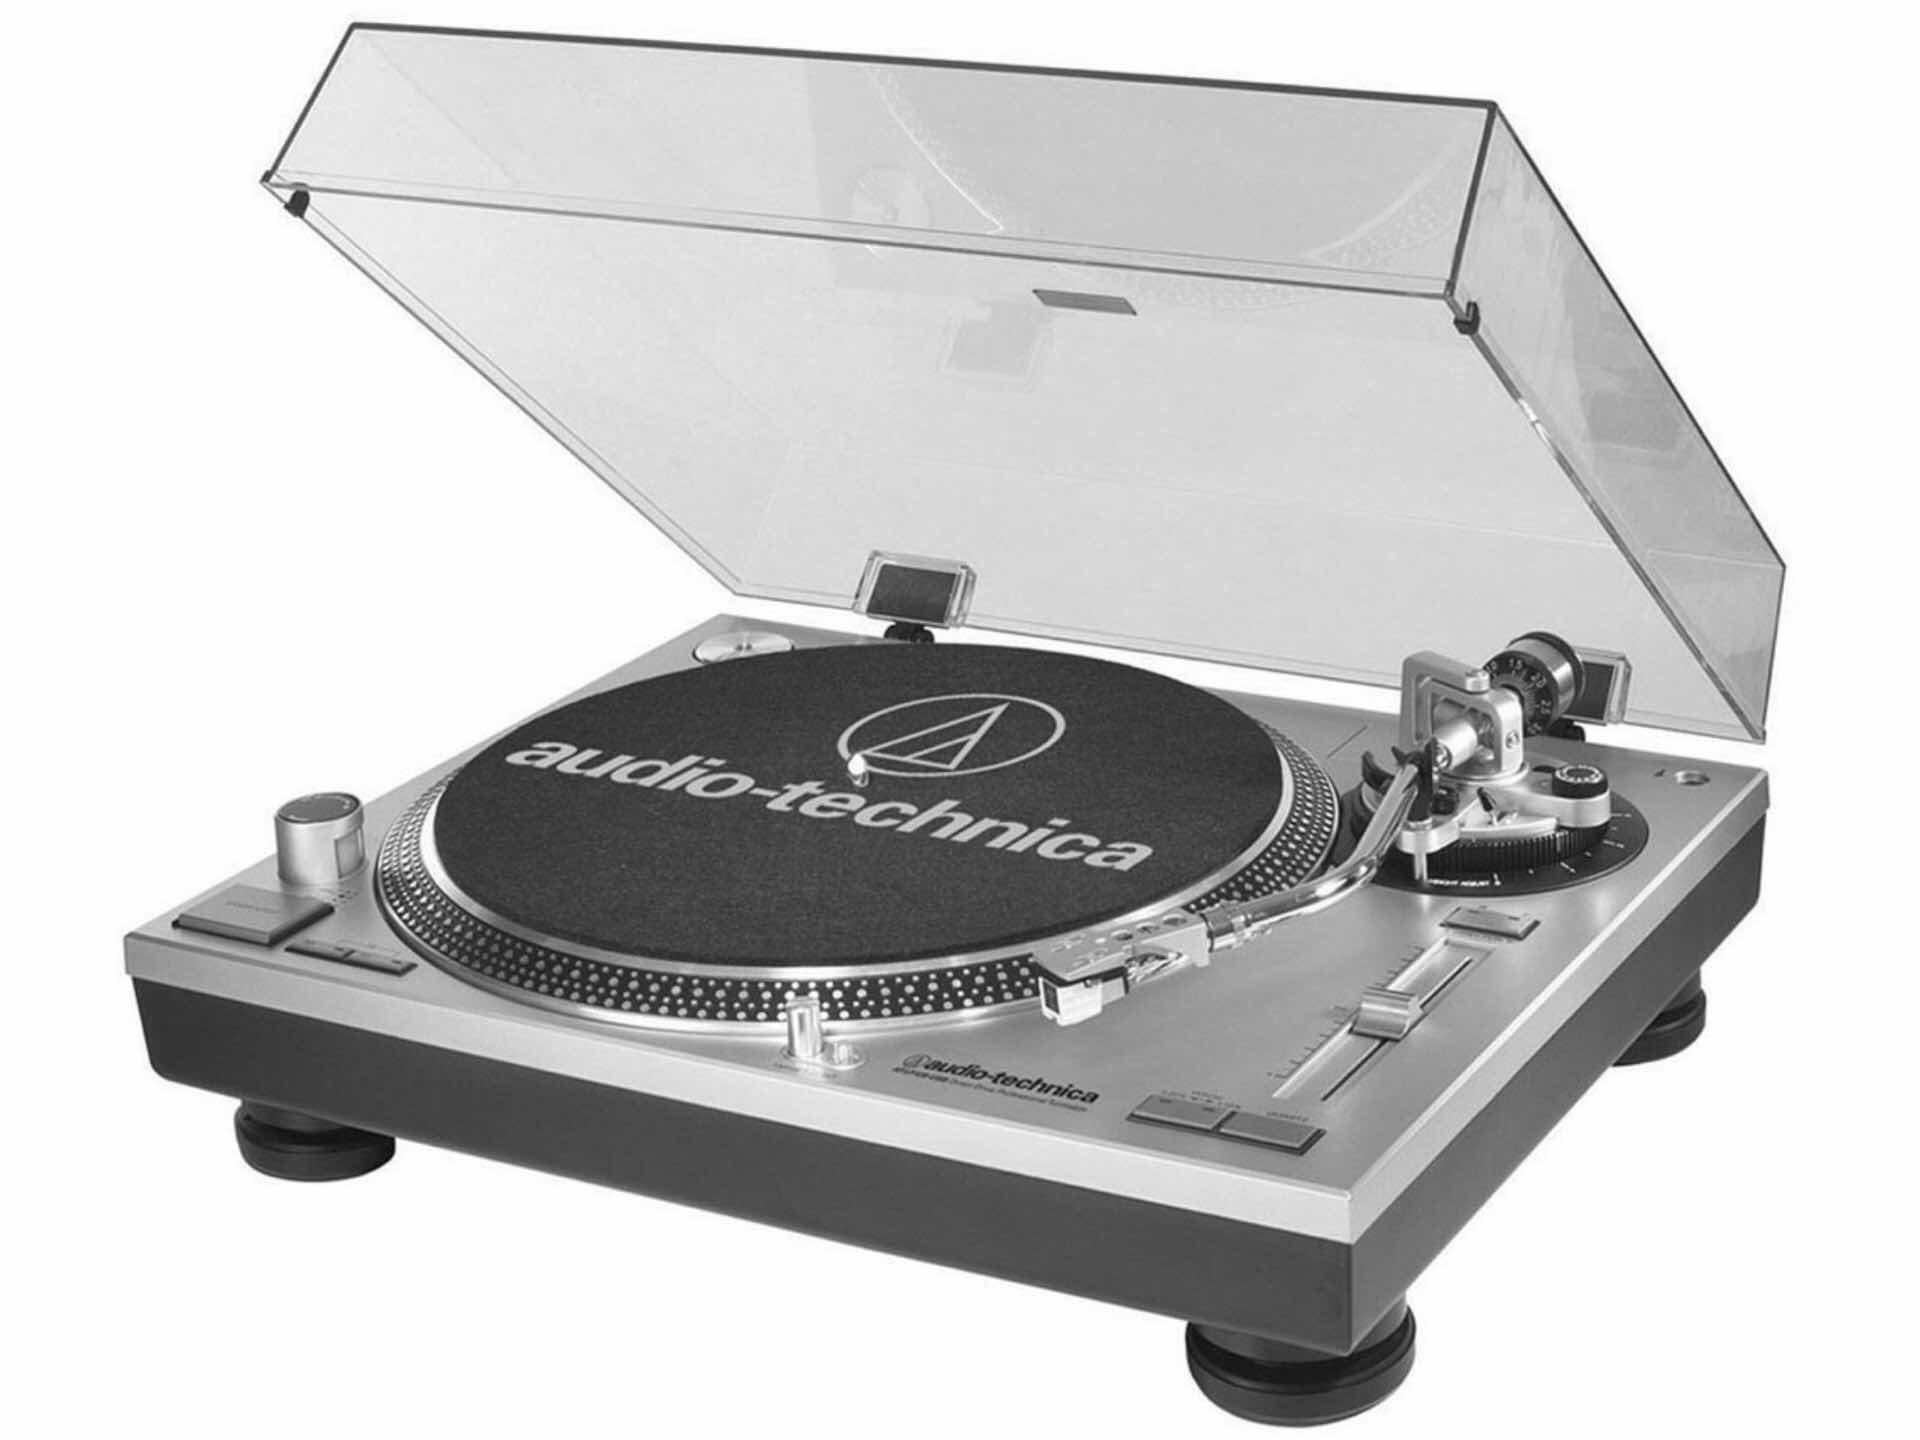 audio-technica-at-lp120-usb-vinyl-record-player